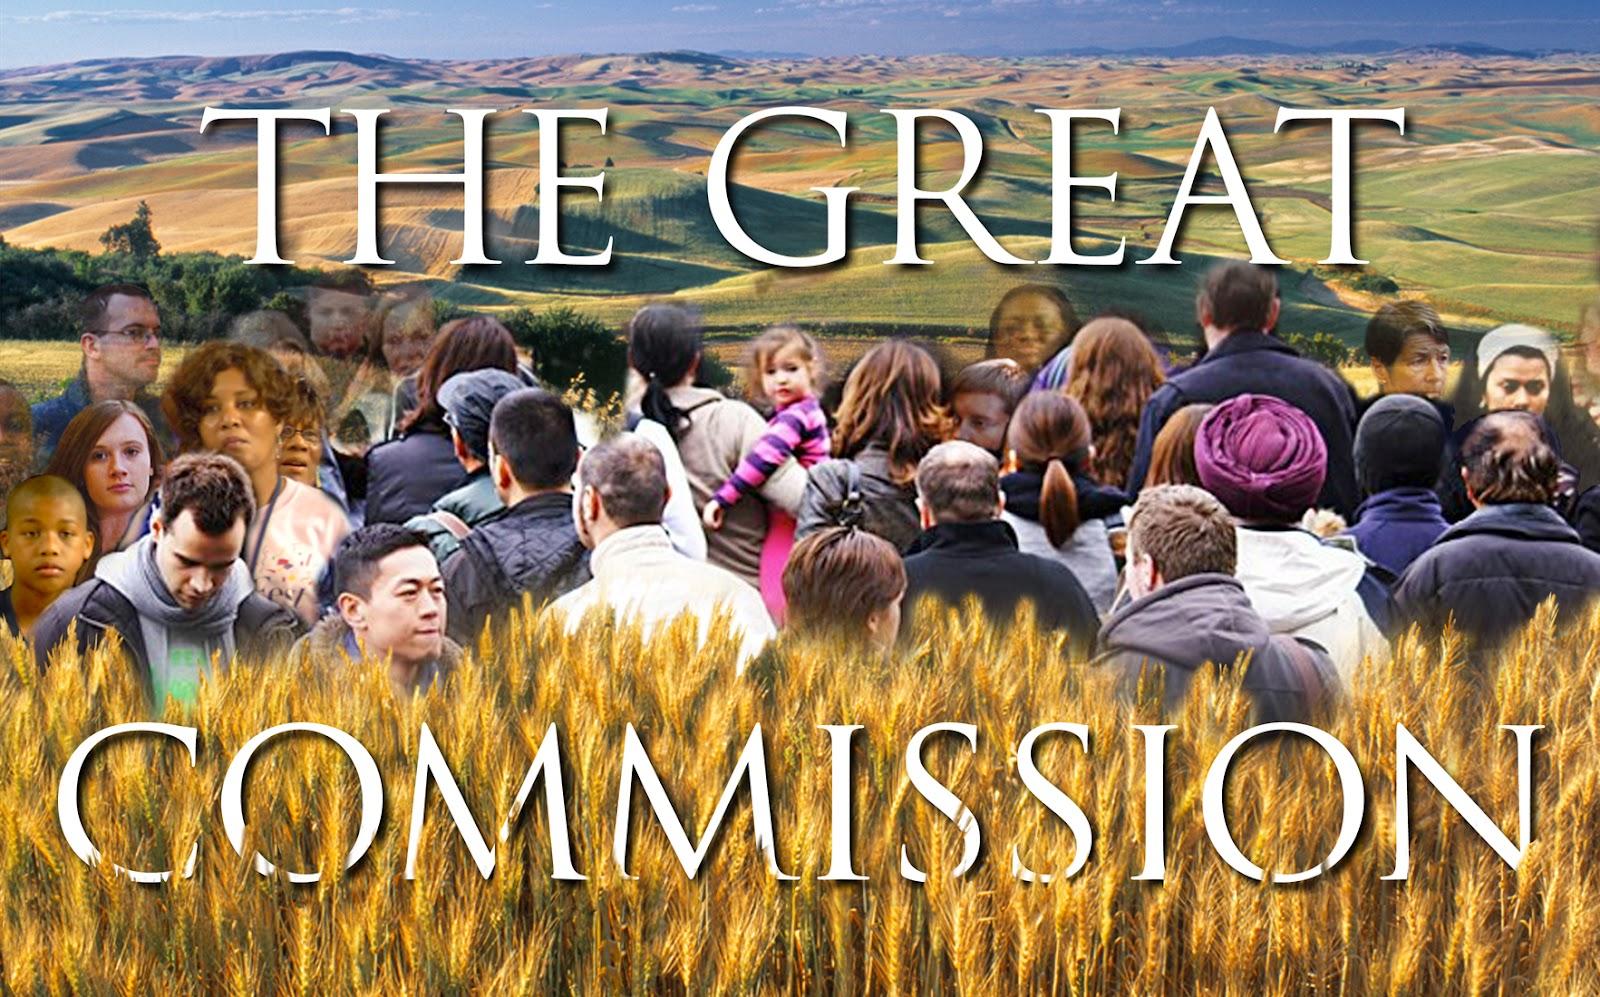 TheGreatCommission